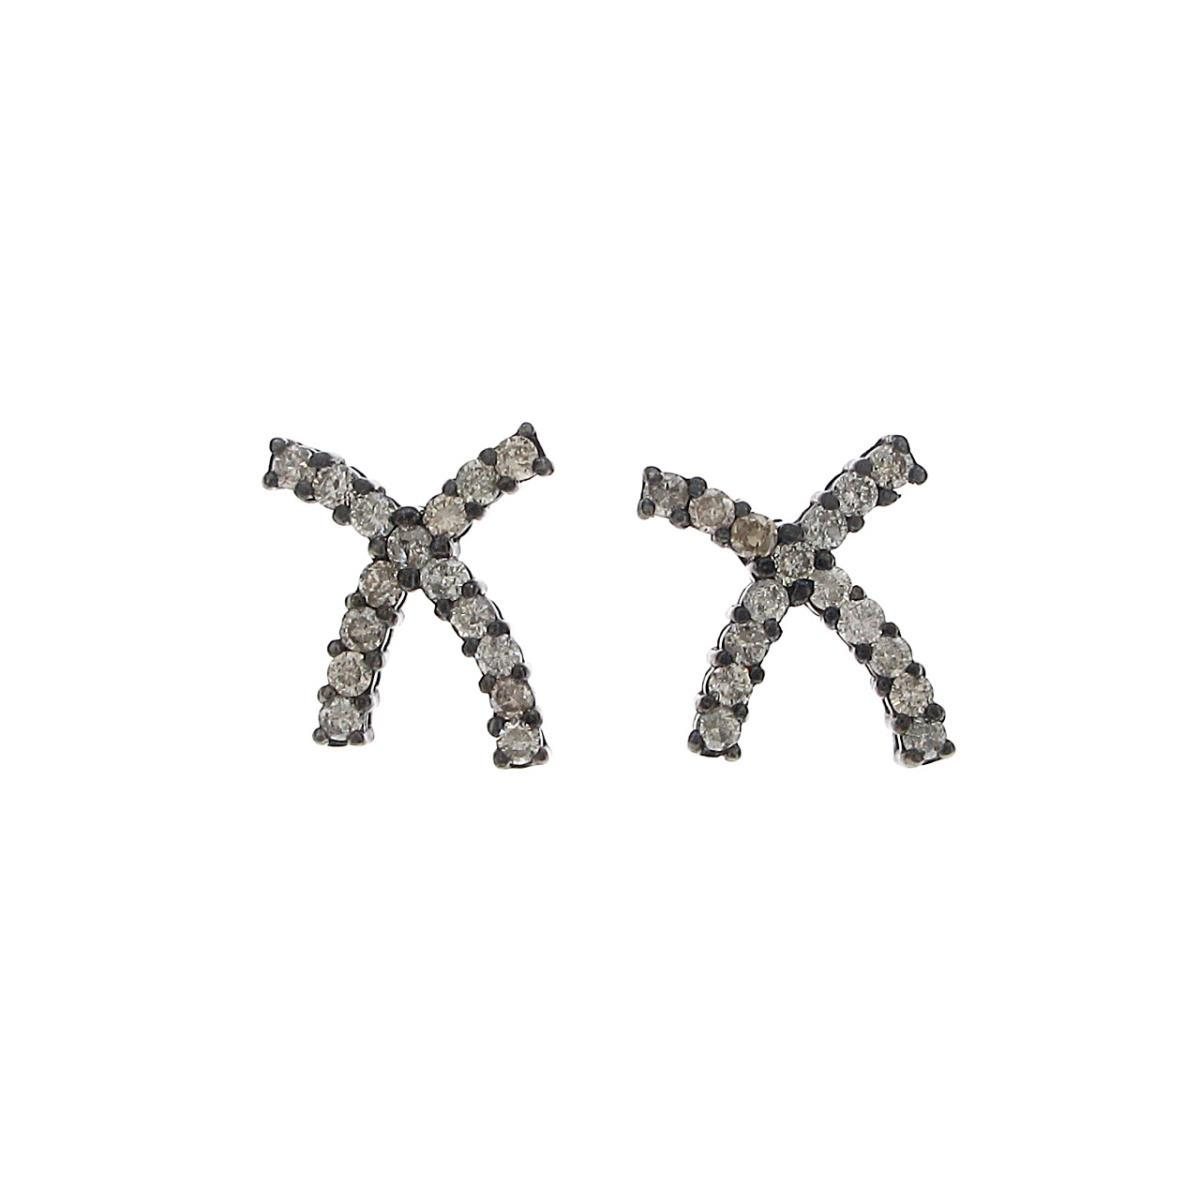 K18BG/K18WG ダイヤモンドピアス【中古】